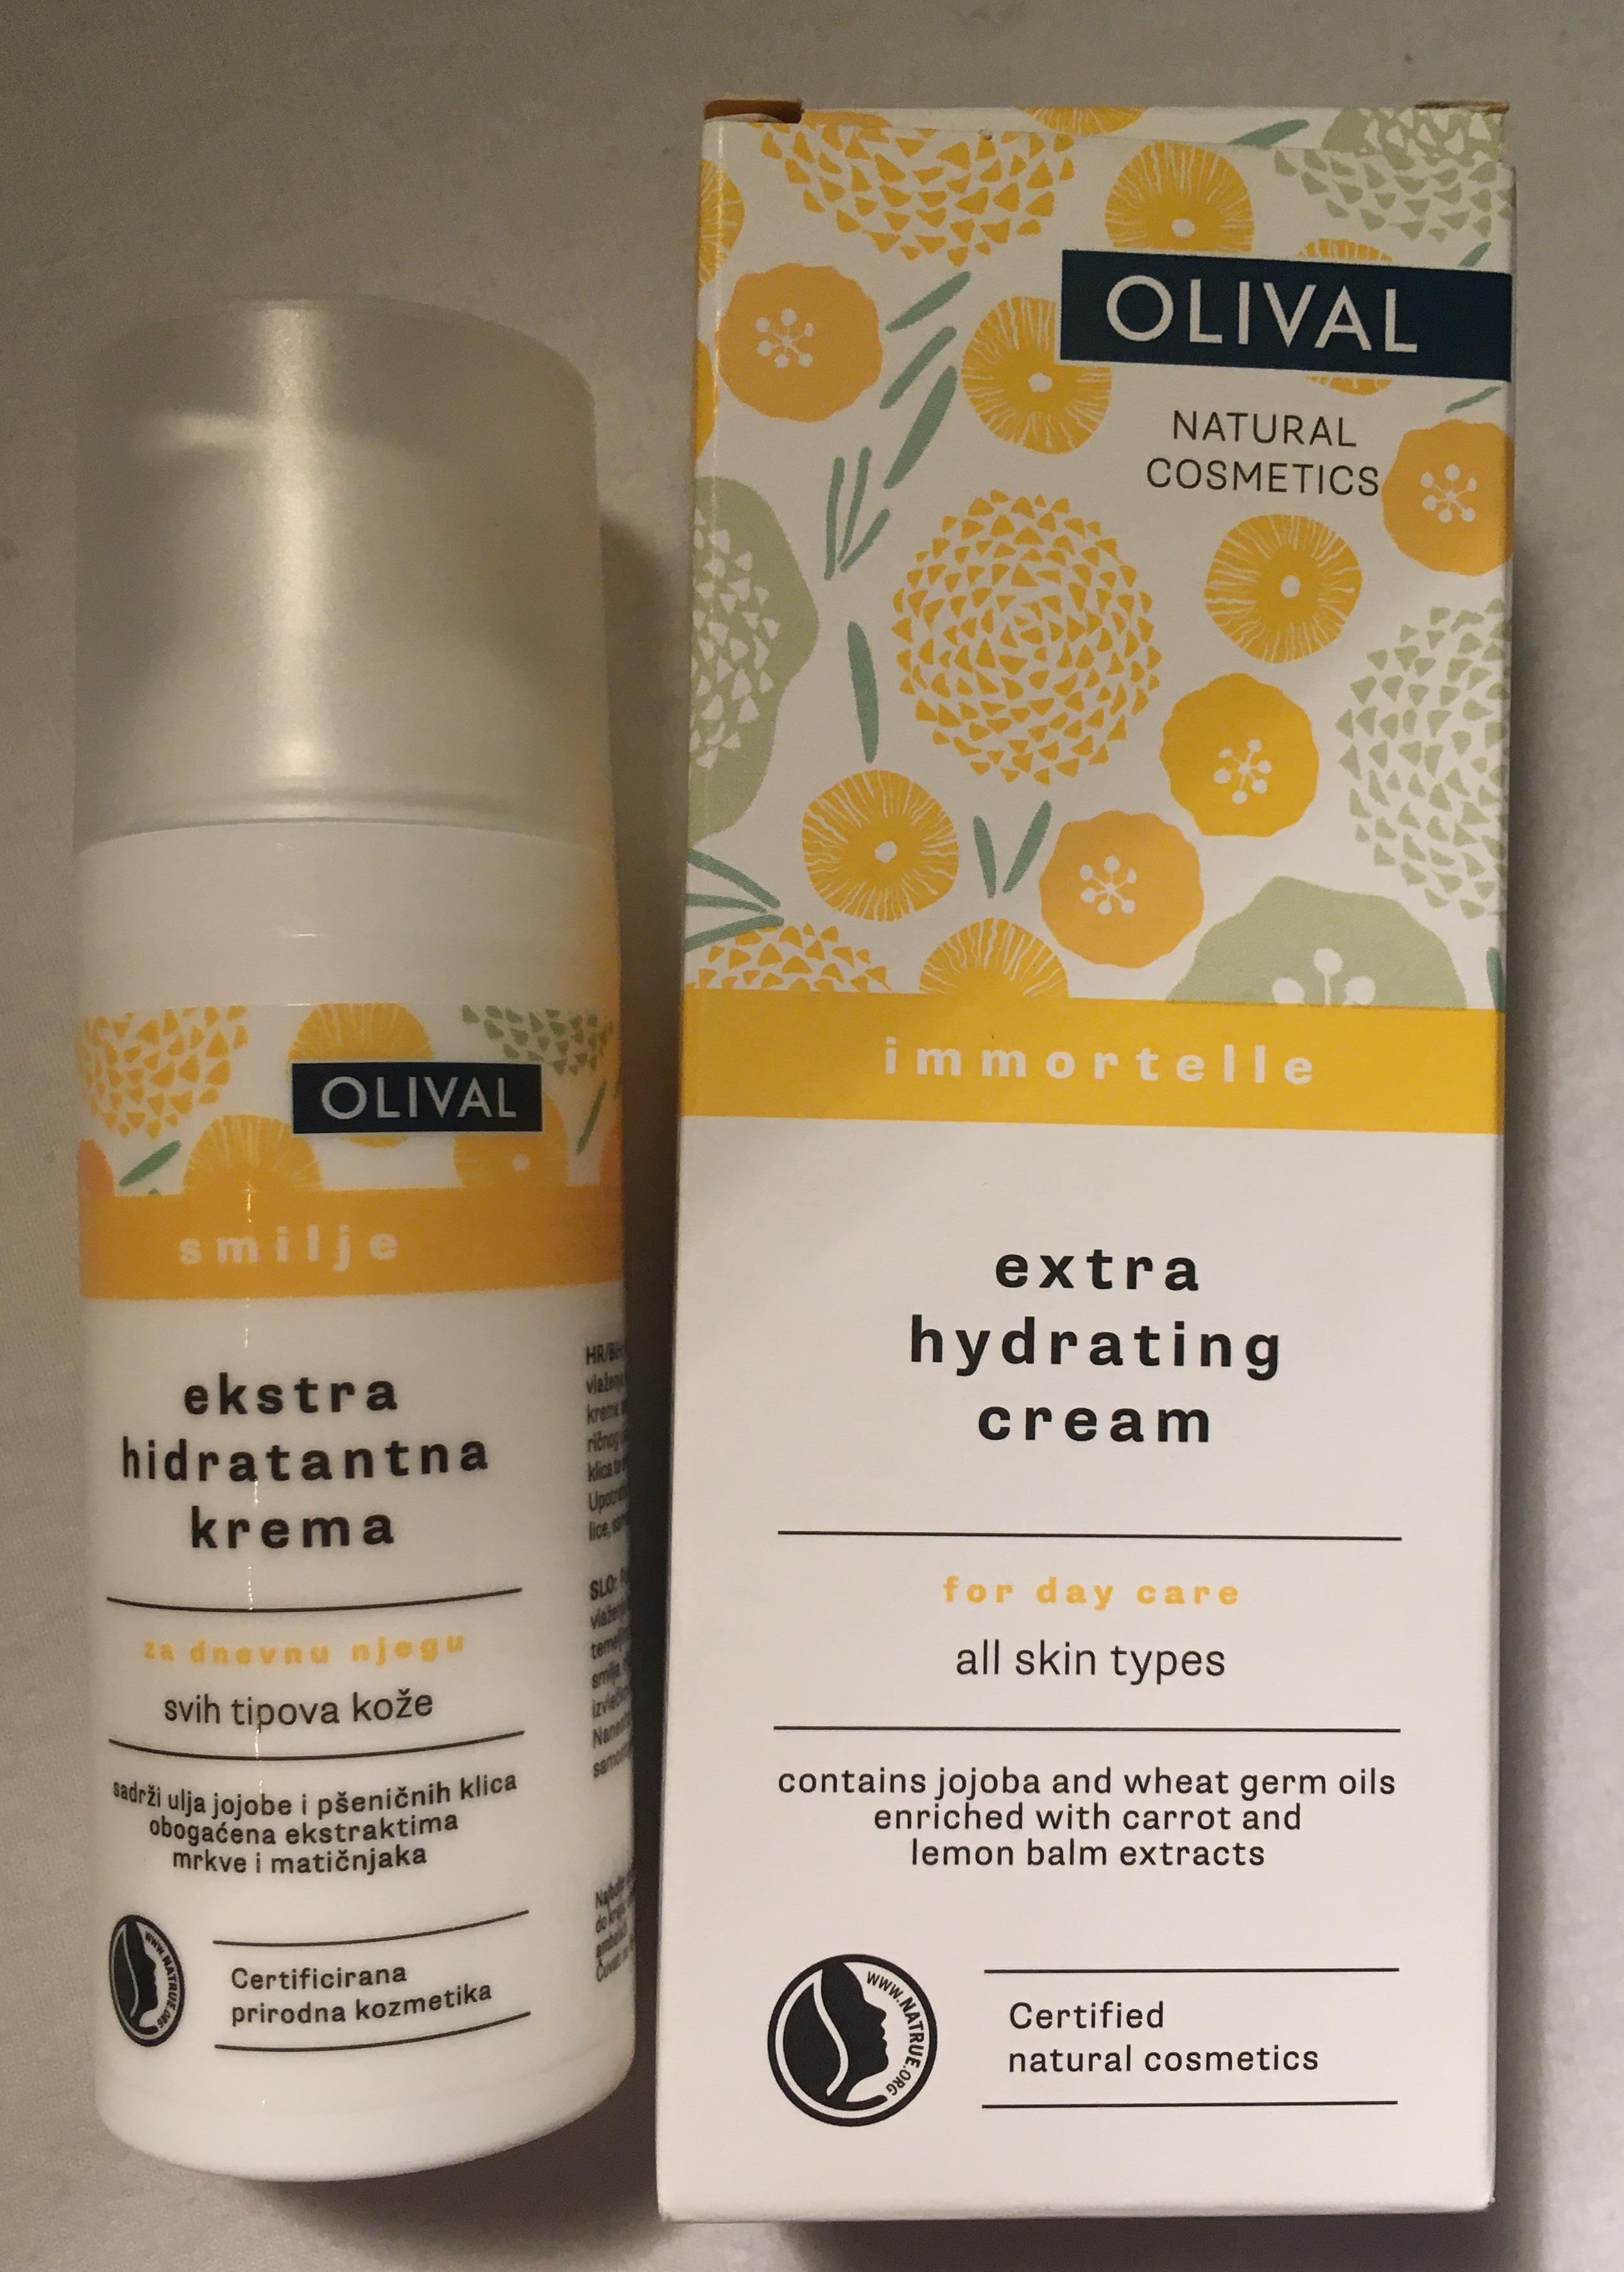 Olival Extra Hydrating Cream